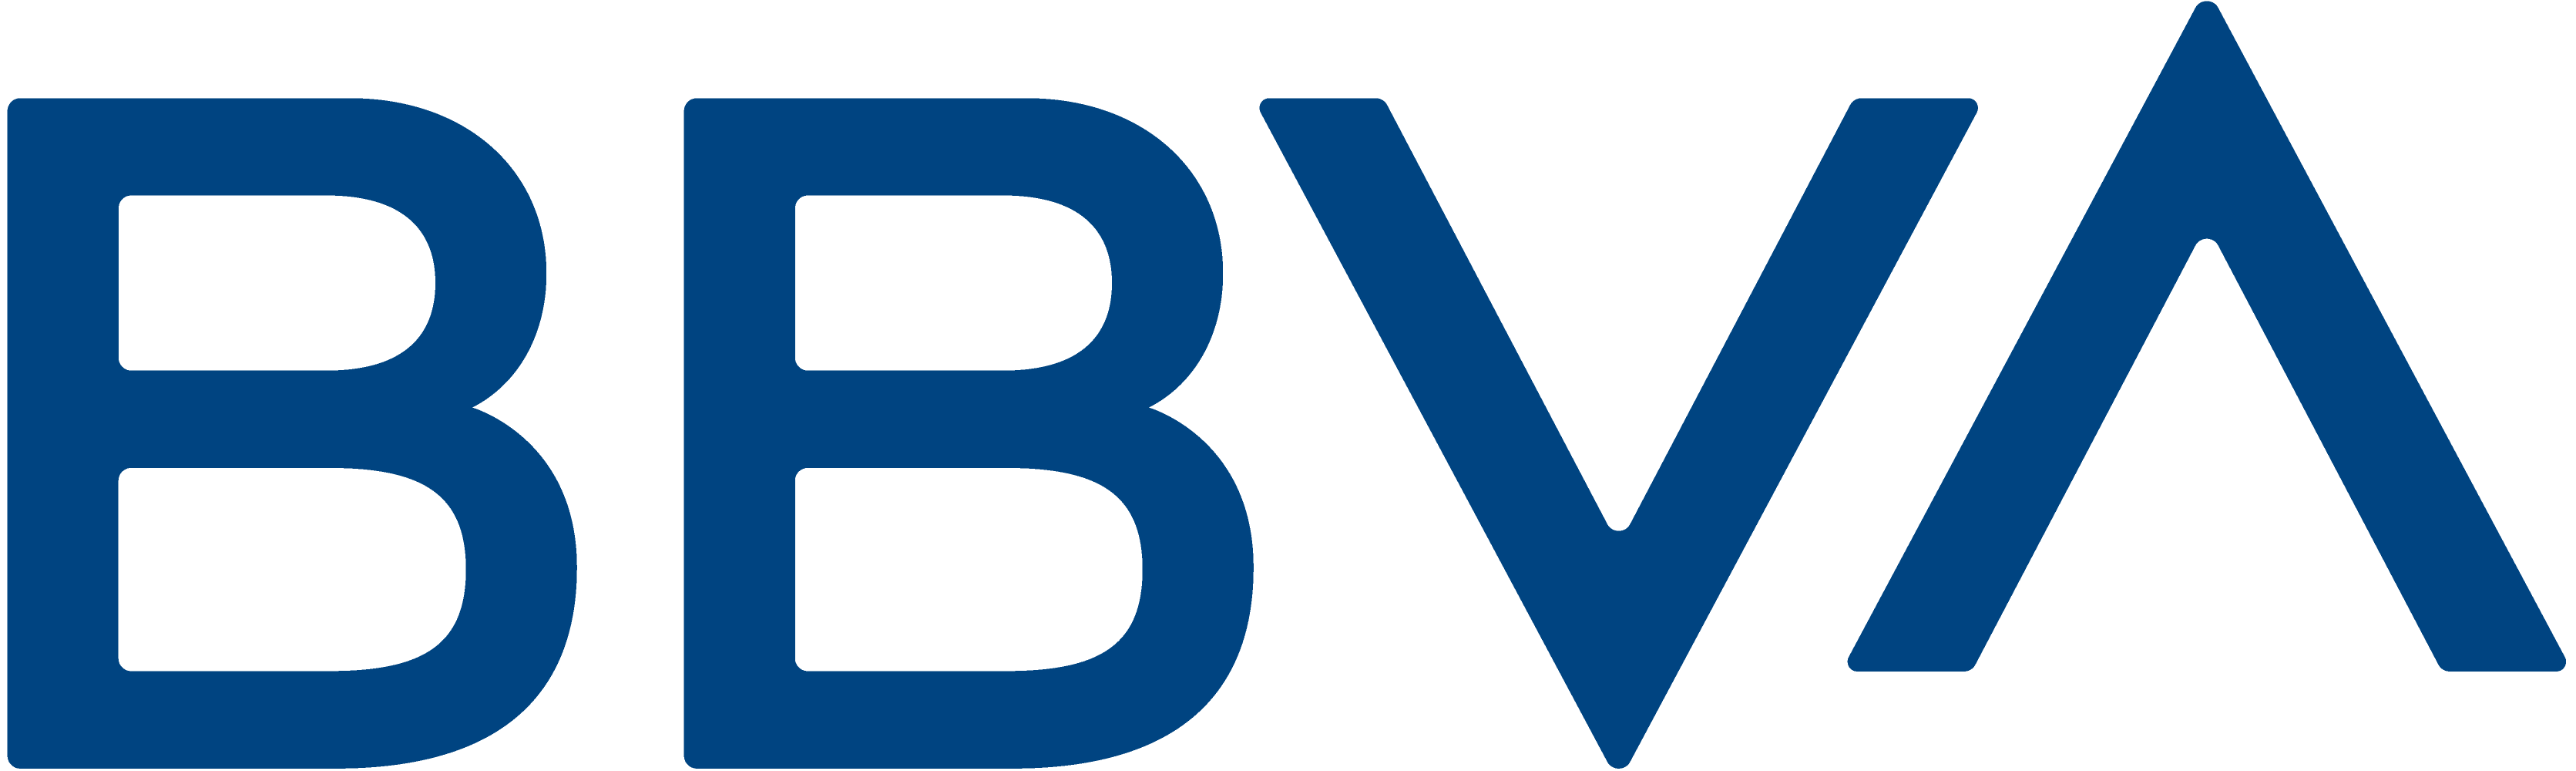 BBVA_RGB